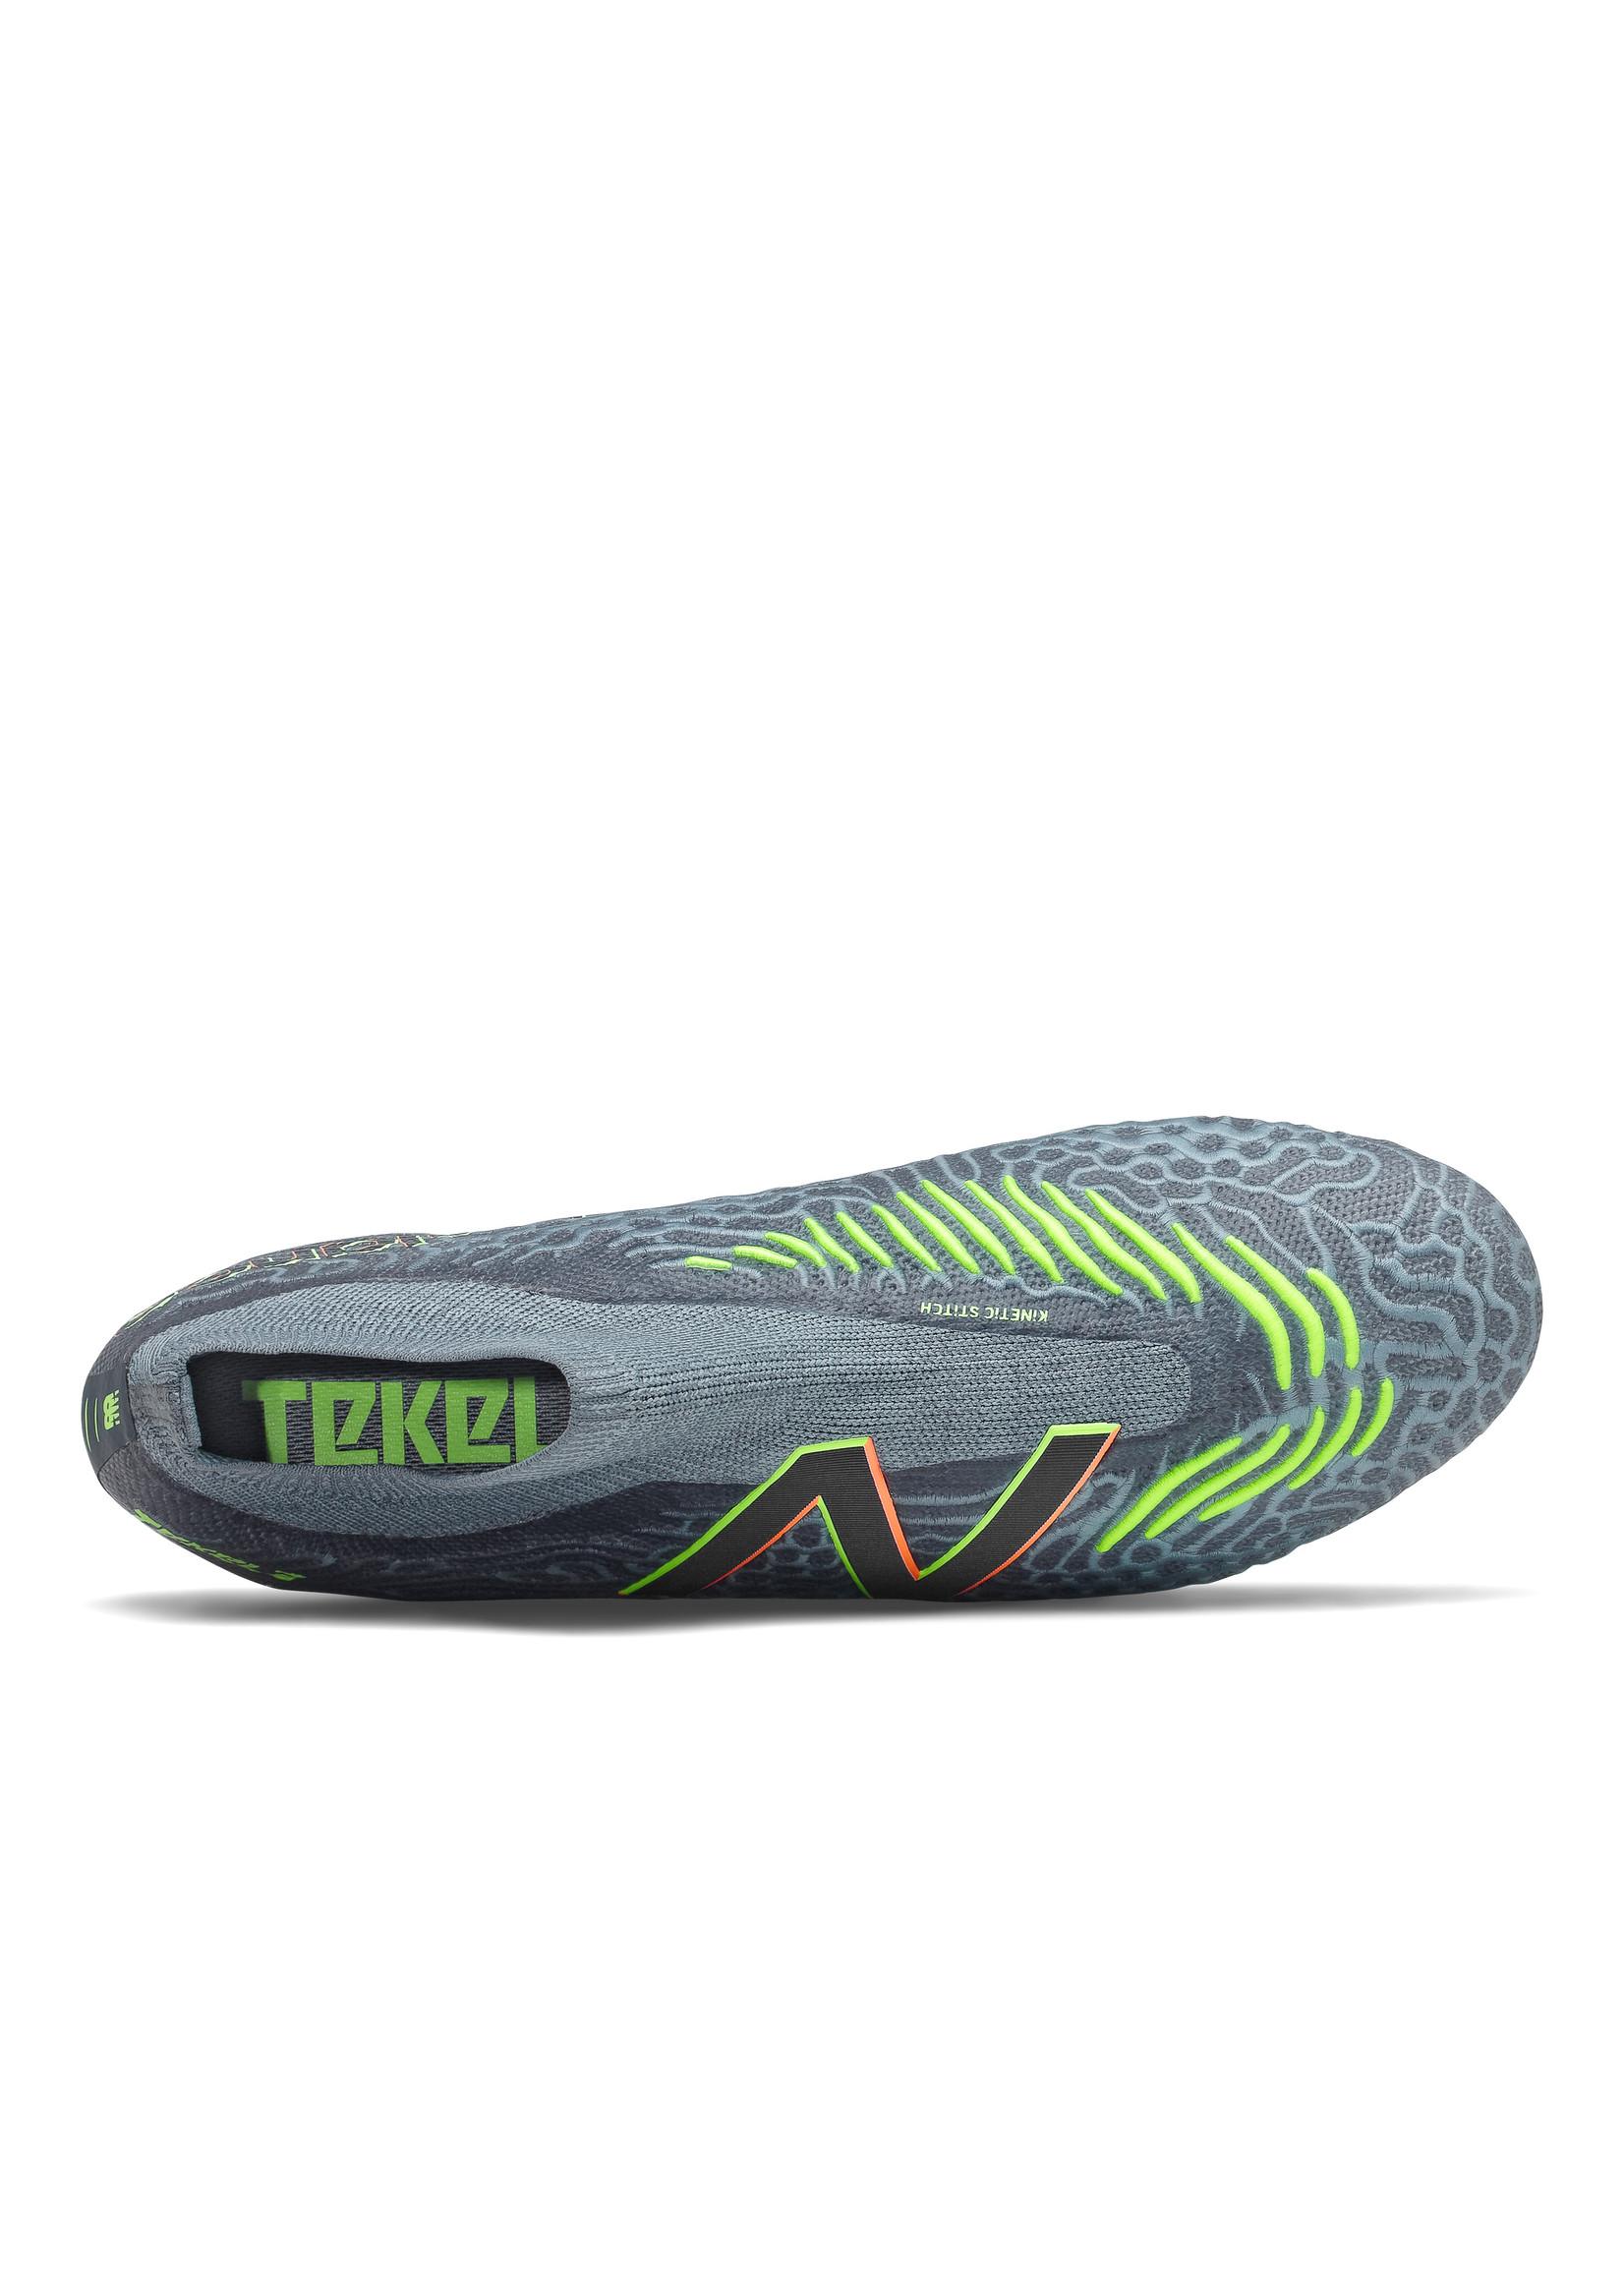 New Balance Tekela V3 Pro FG - Grey